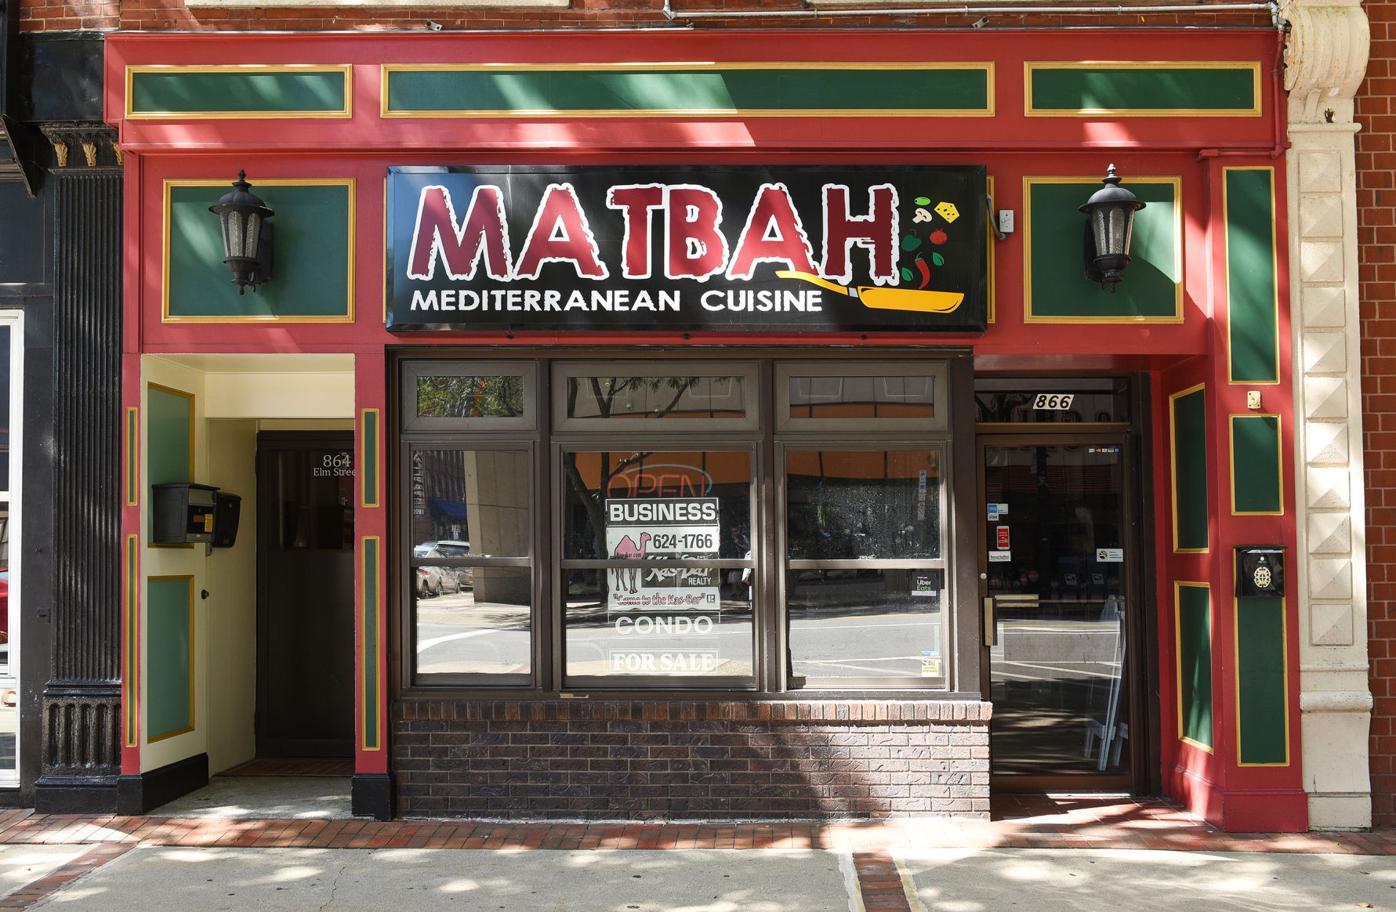 Matbah Mediterranean Cuisine closed in April